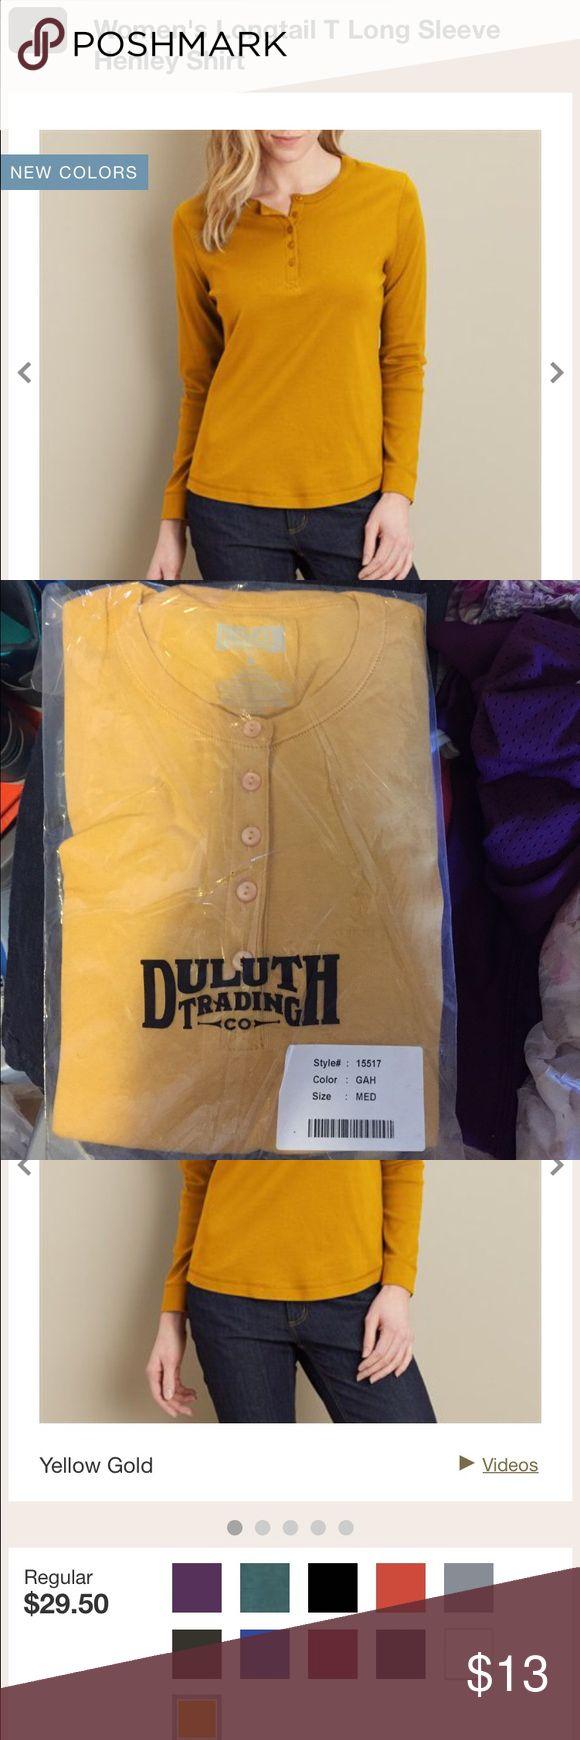 Women's Longtail T Long Sleeve Henley Shirt Duluth Trading Company Woman's Longtail T Long Sleeve Henley Shirt, new , still in the packing wrap Duluth Trading Co Tops Tees - Long Sleeve